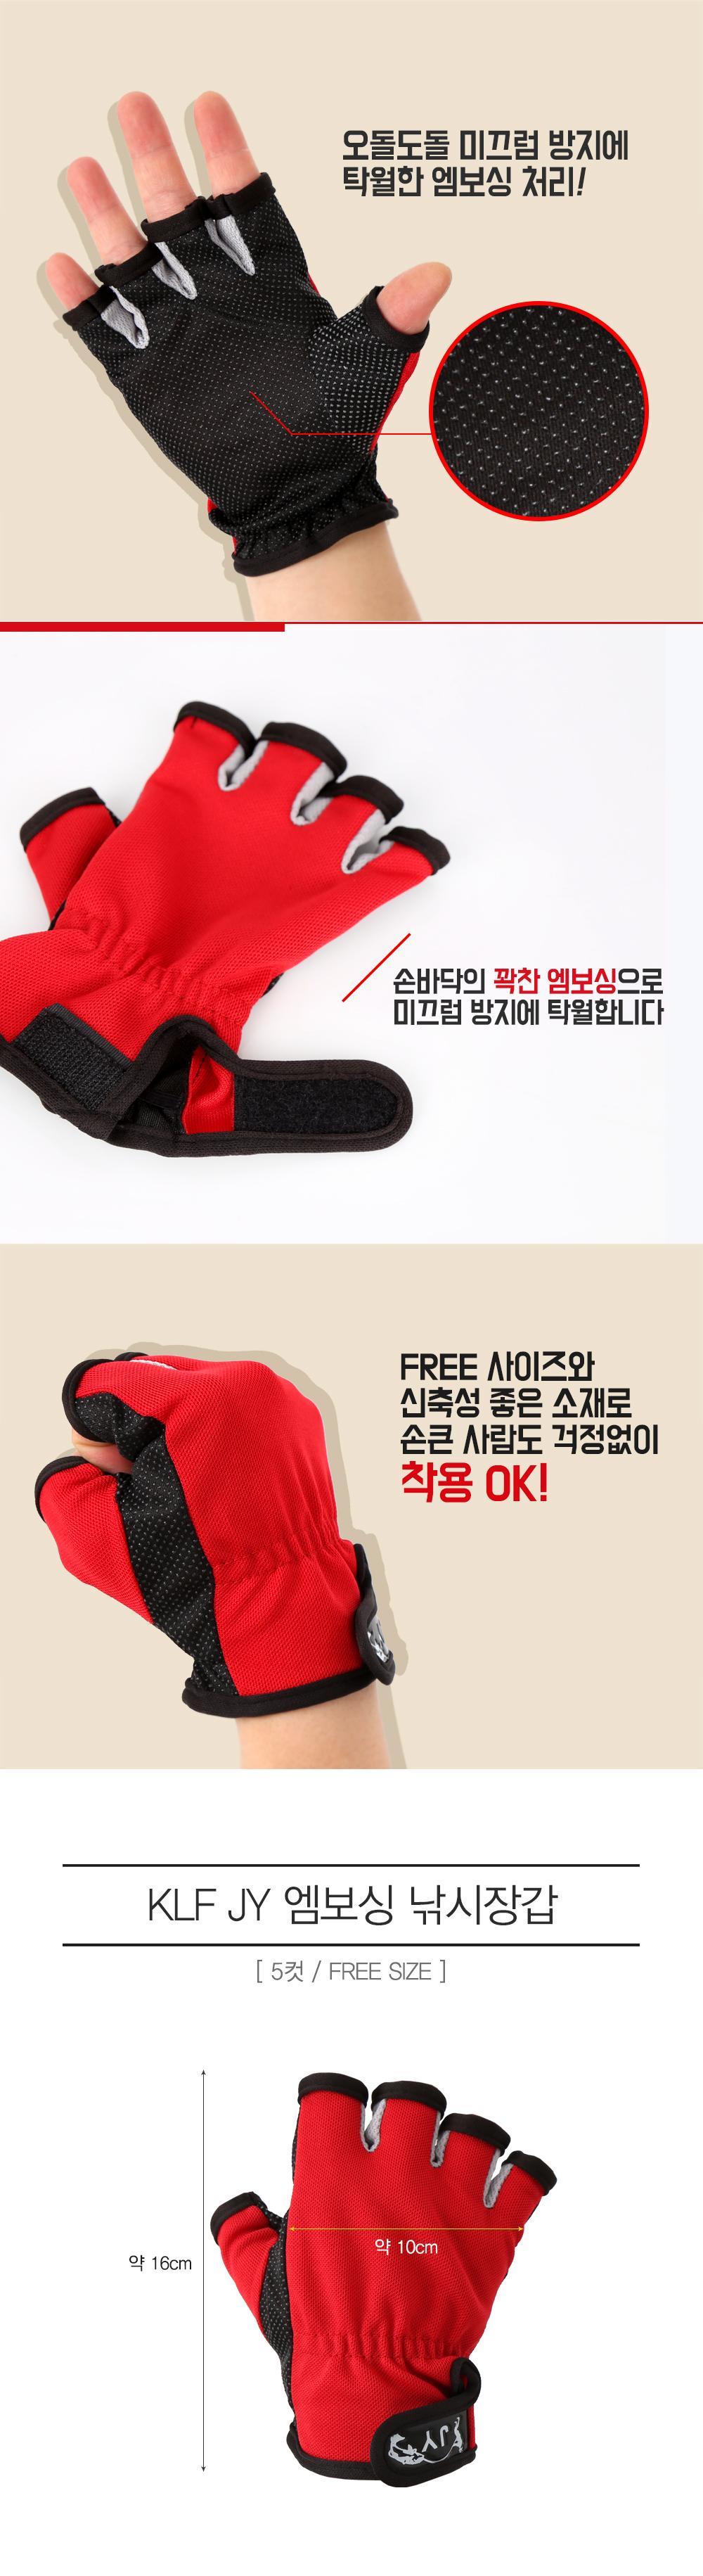 KLF JY 엠보싱 낚시장갑 낚시장갑 장갑 피싱글로브 글로브 5컷장갑 5컷